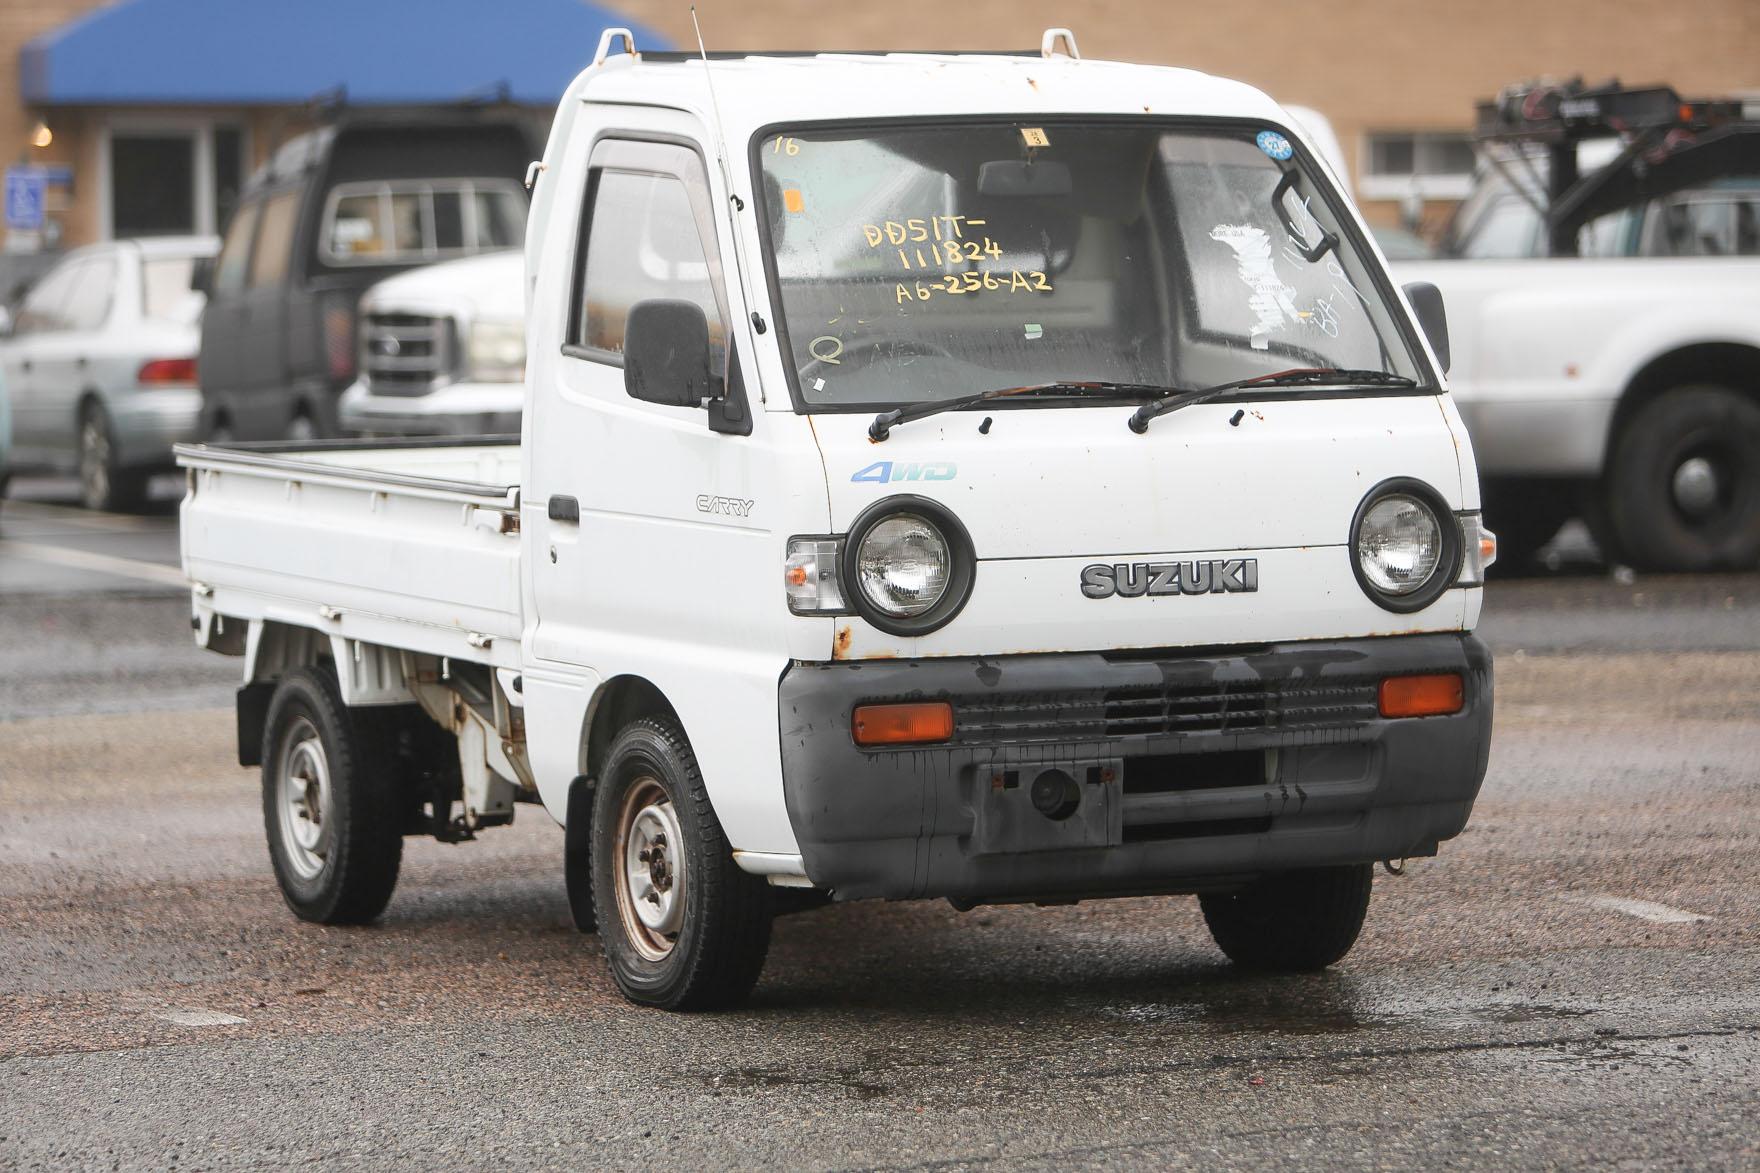 1991 Suzuki Carry 4WD - $5,950